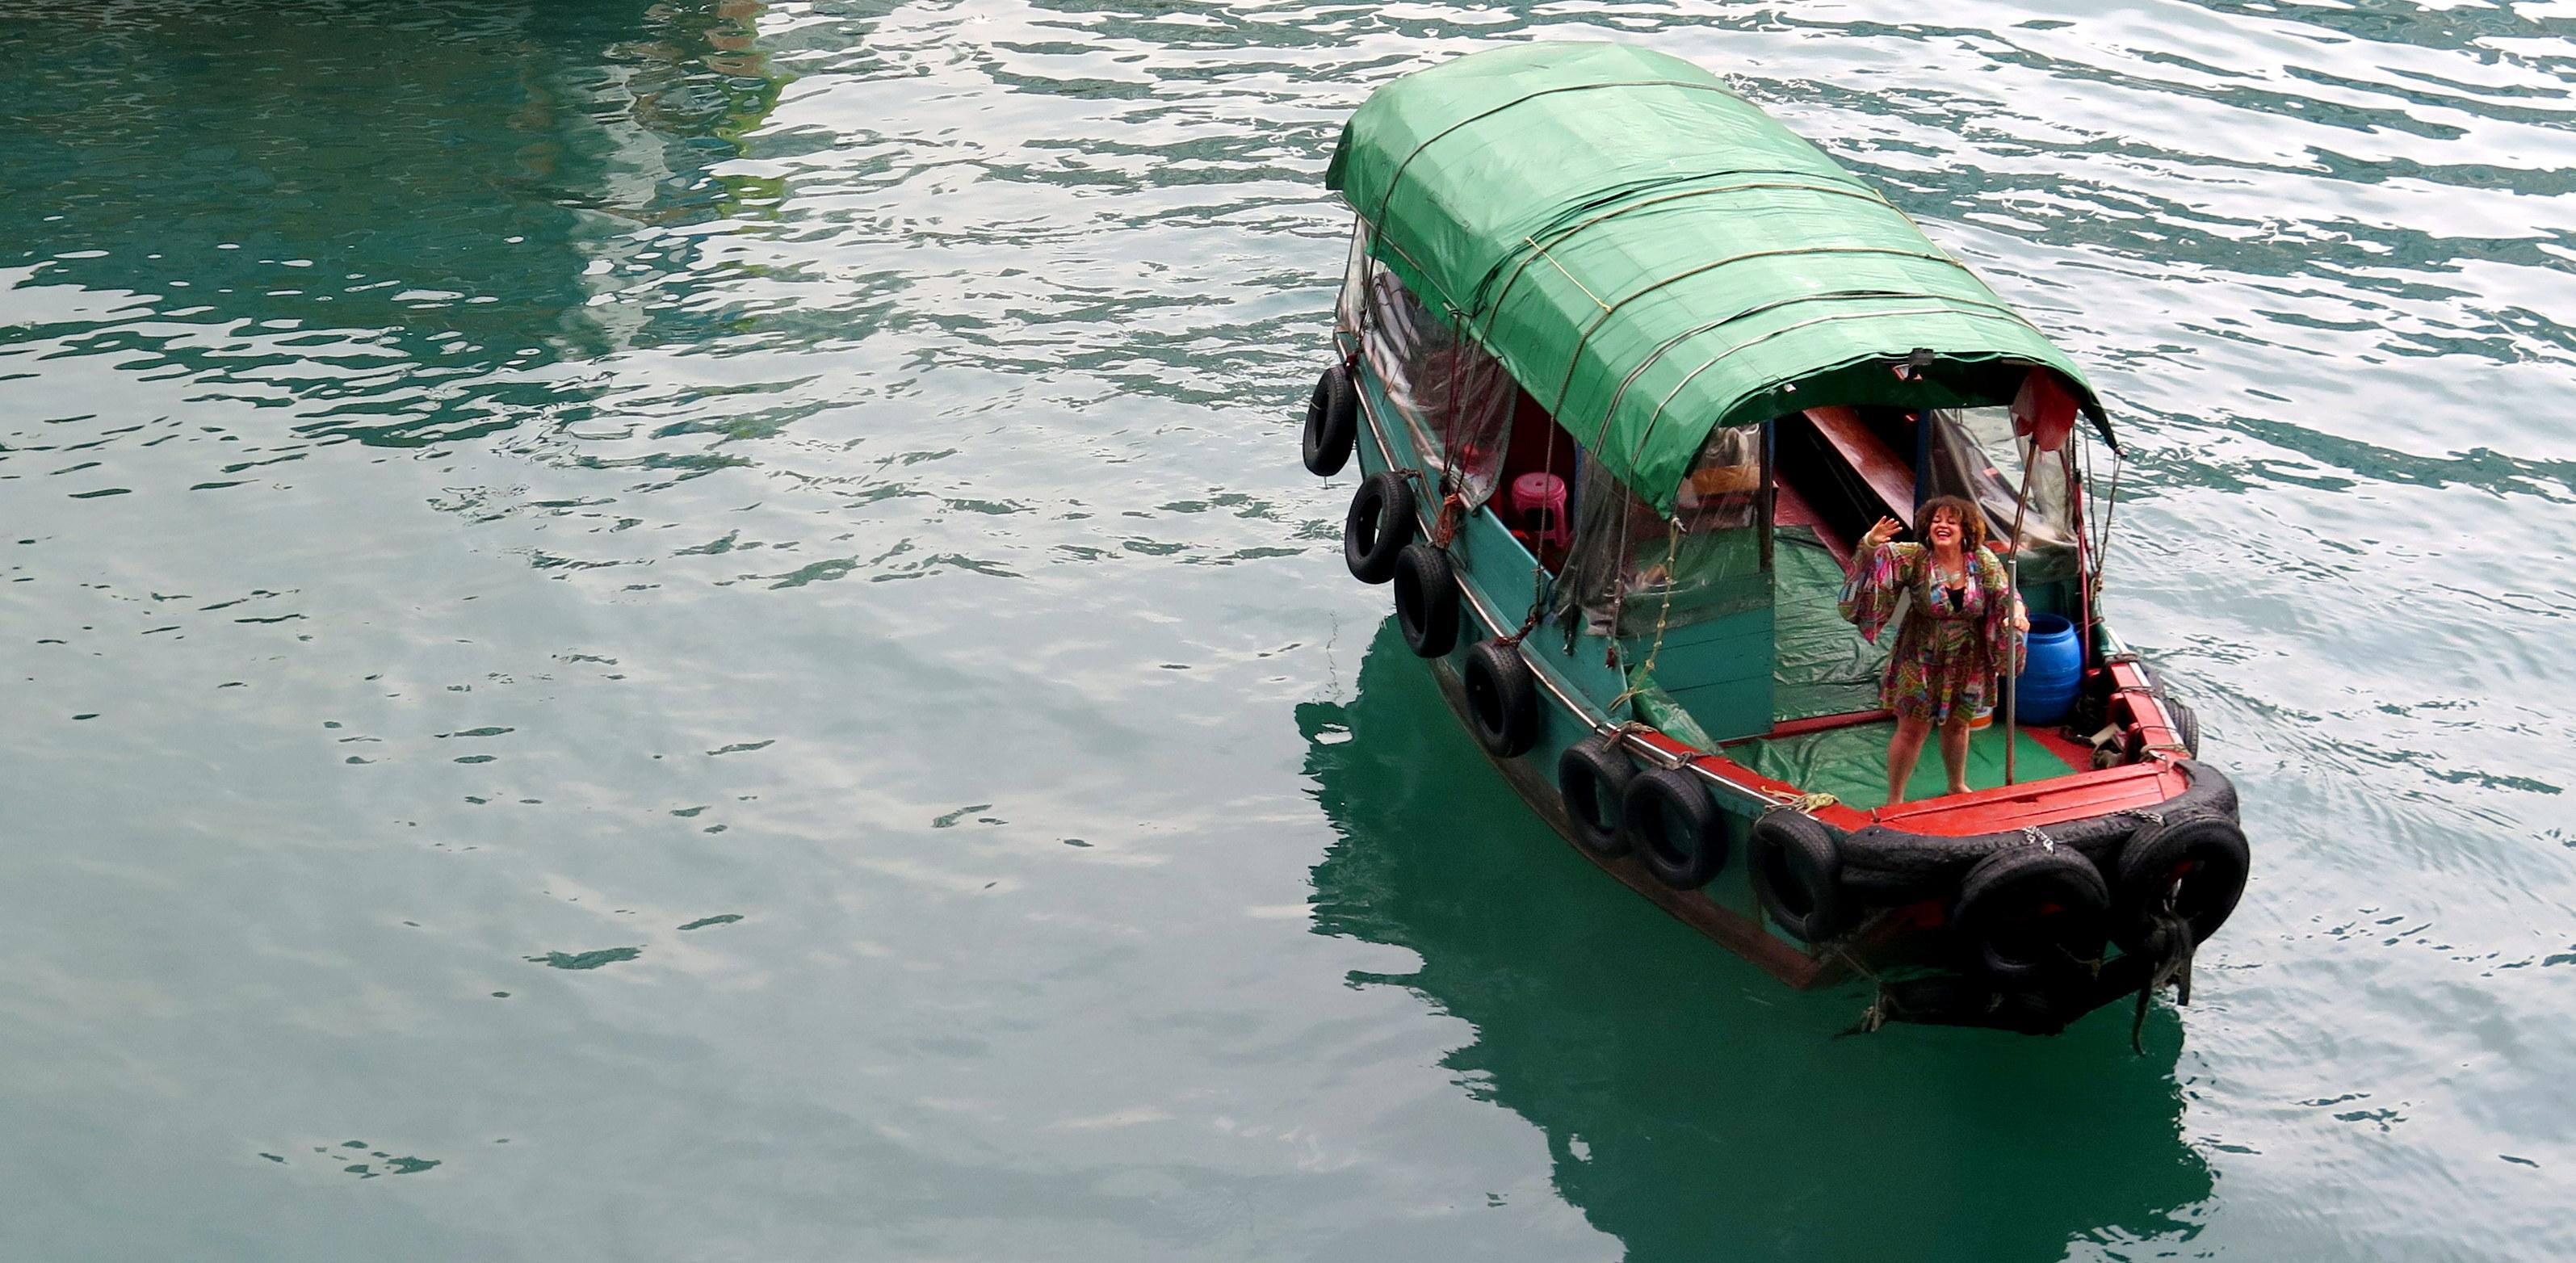 The Voyage - May Yeung - 1